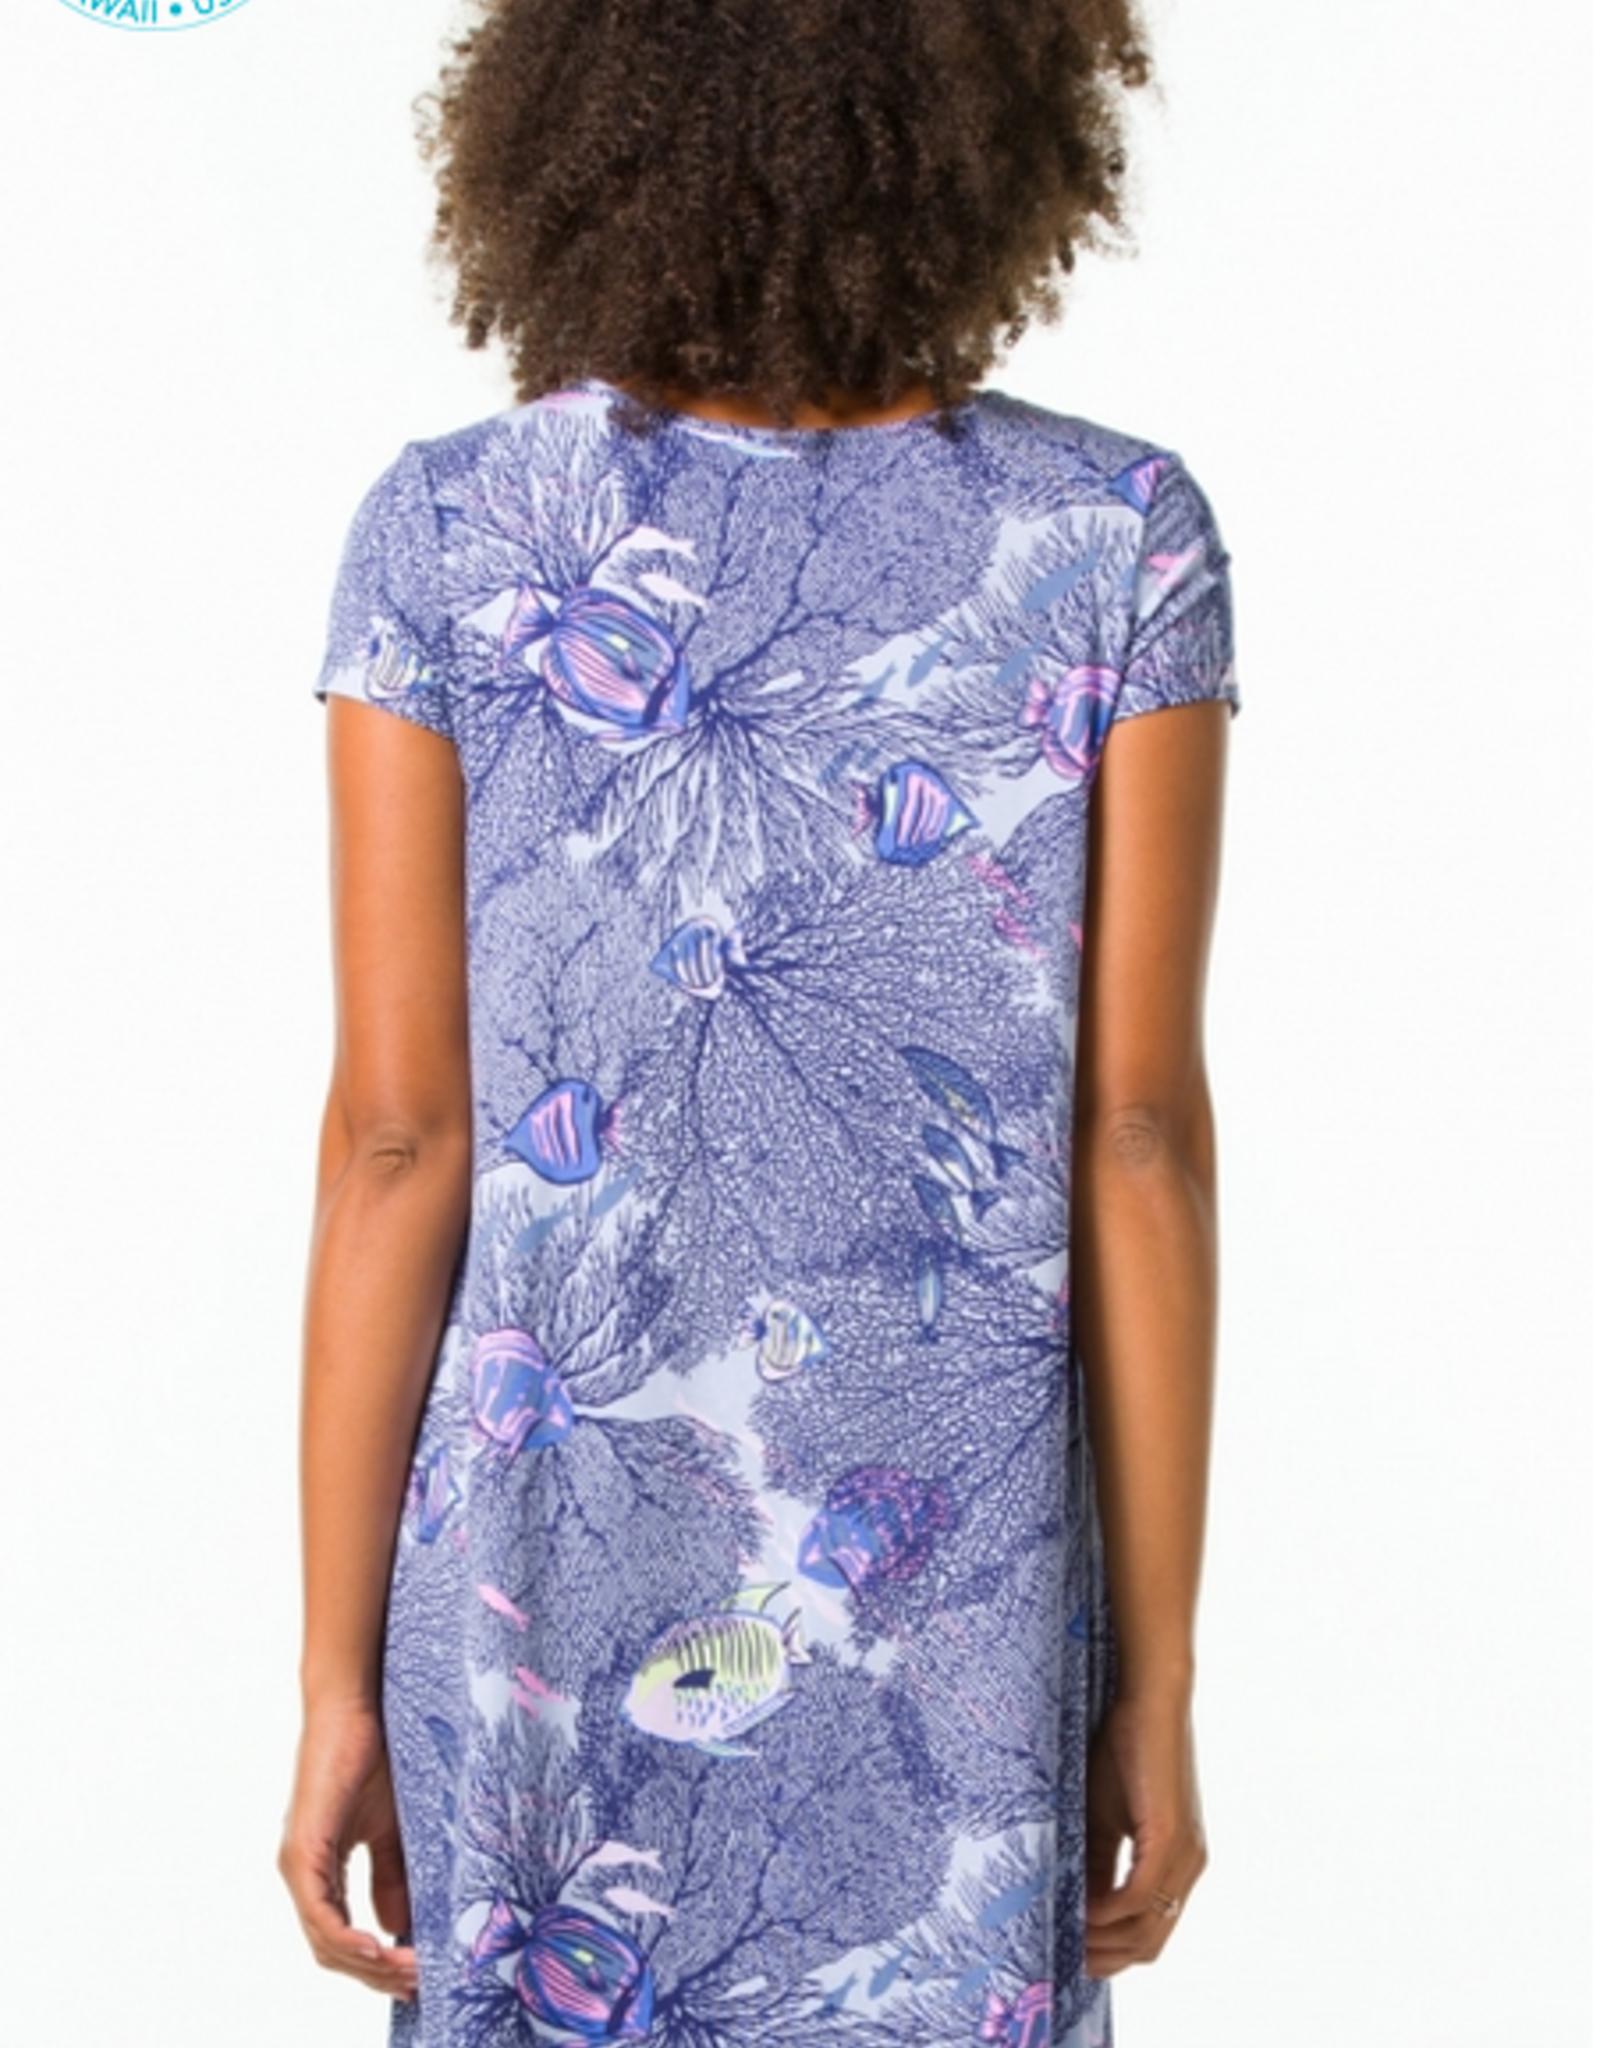 TORI RICHARD KENNEDY DRESS